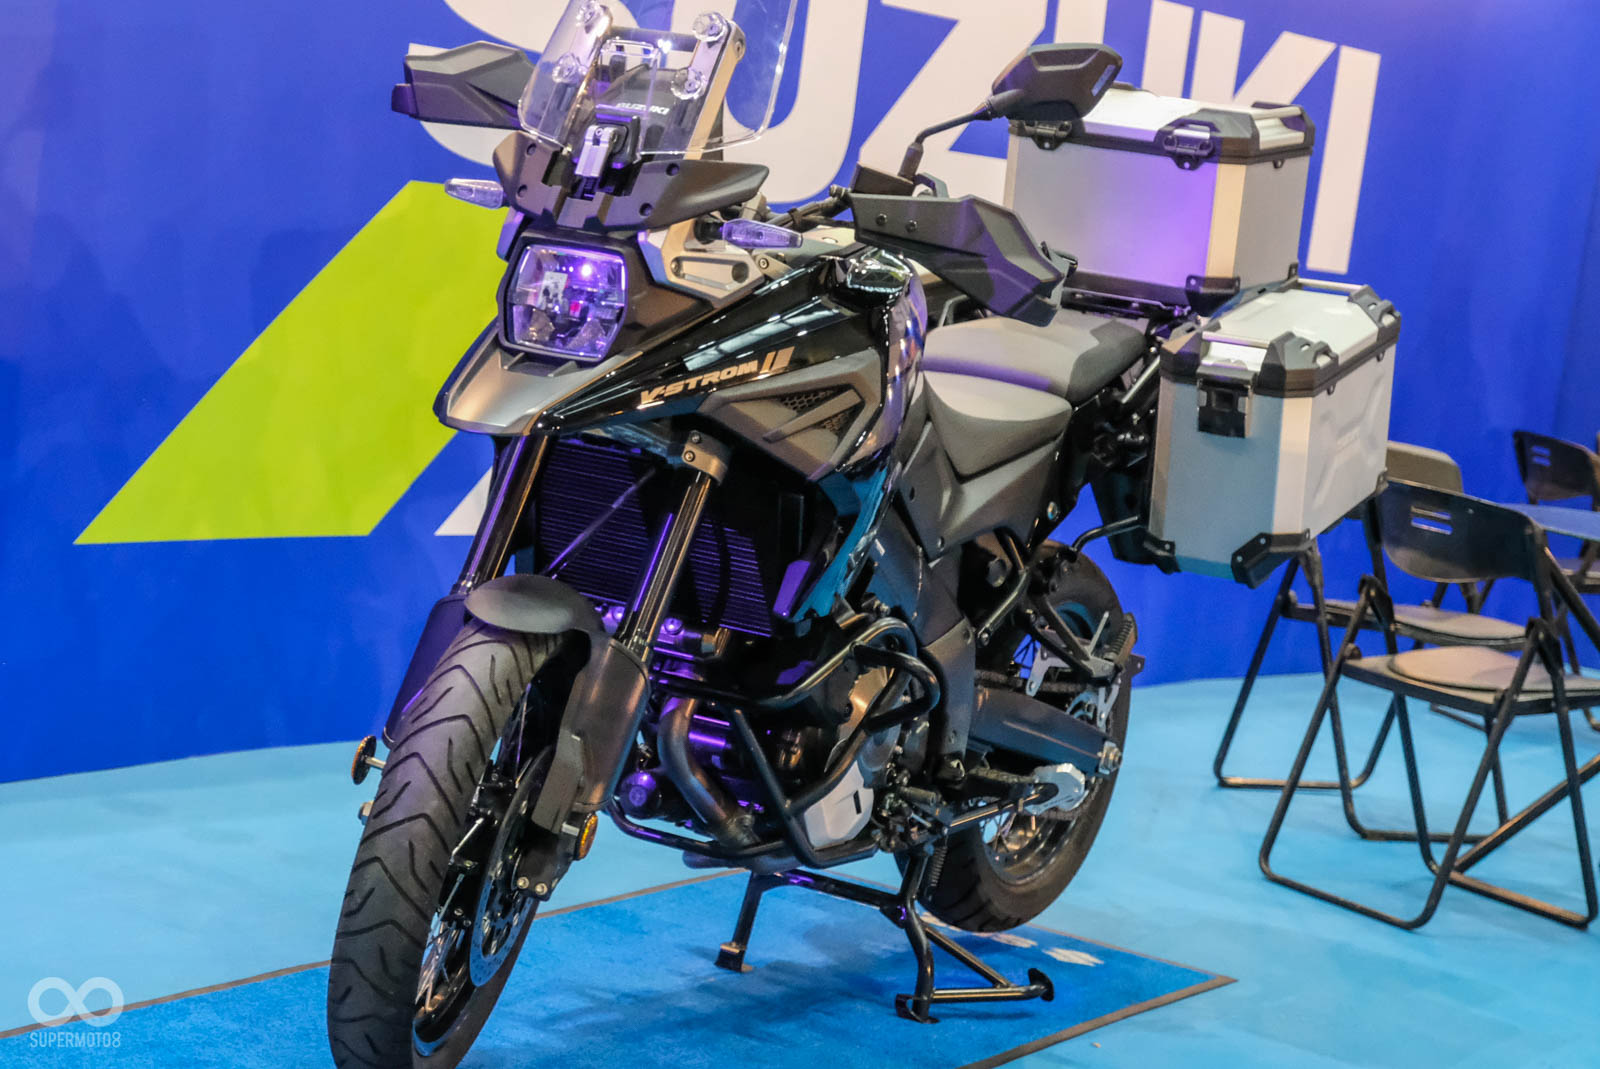 SHOEI X14 6折起出清,BSB冠軍Ducati V4R廠車展示 臺機2勢力週末登場 | SUPERMOTO8